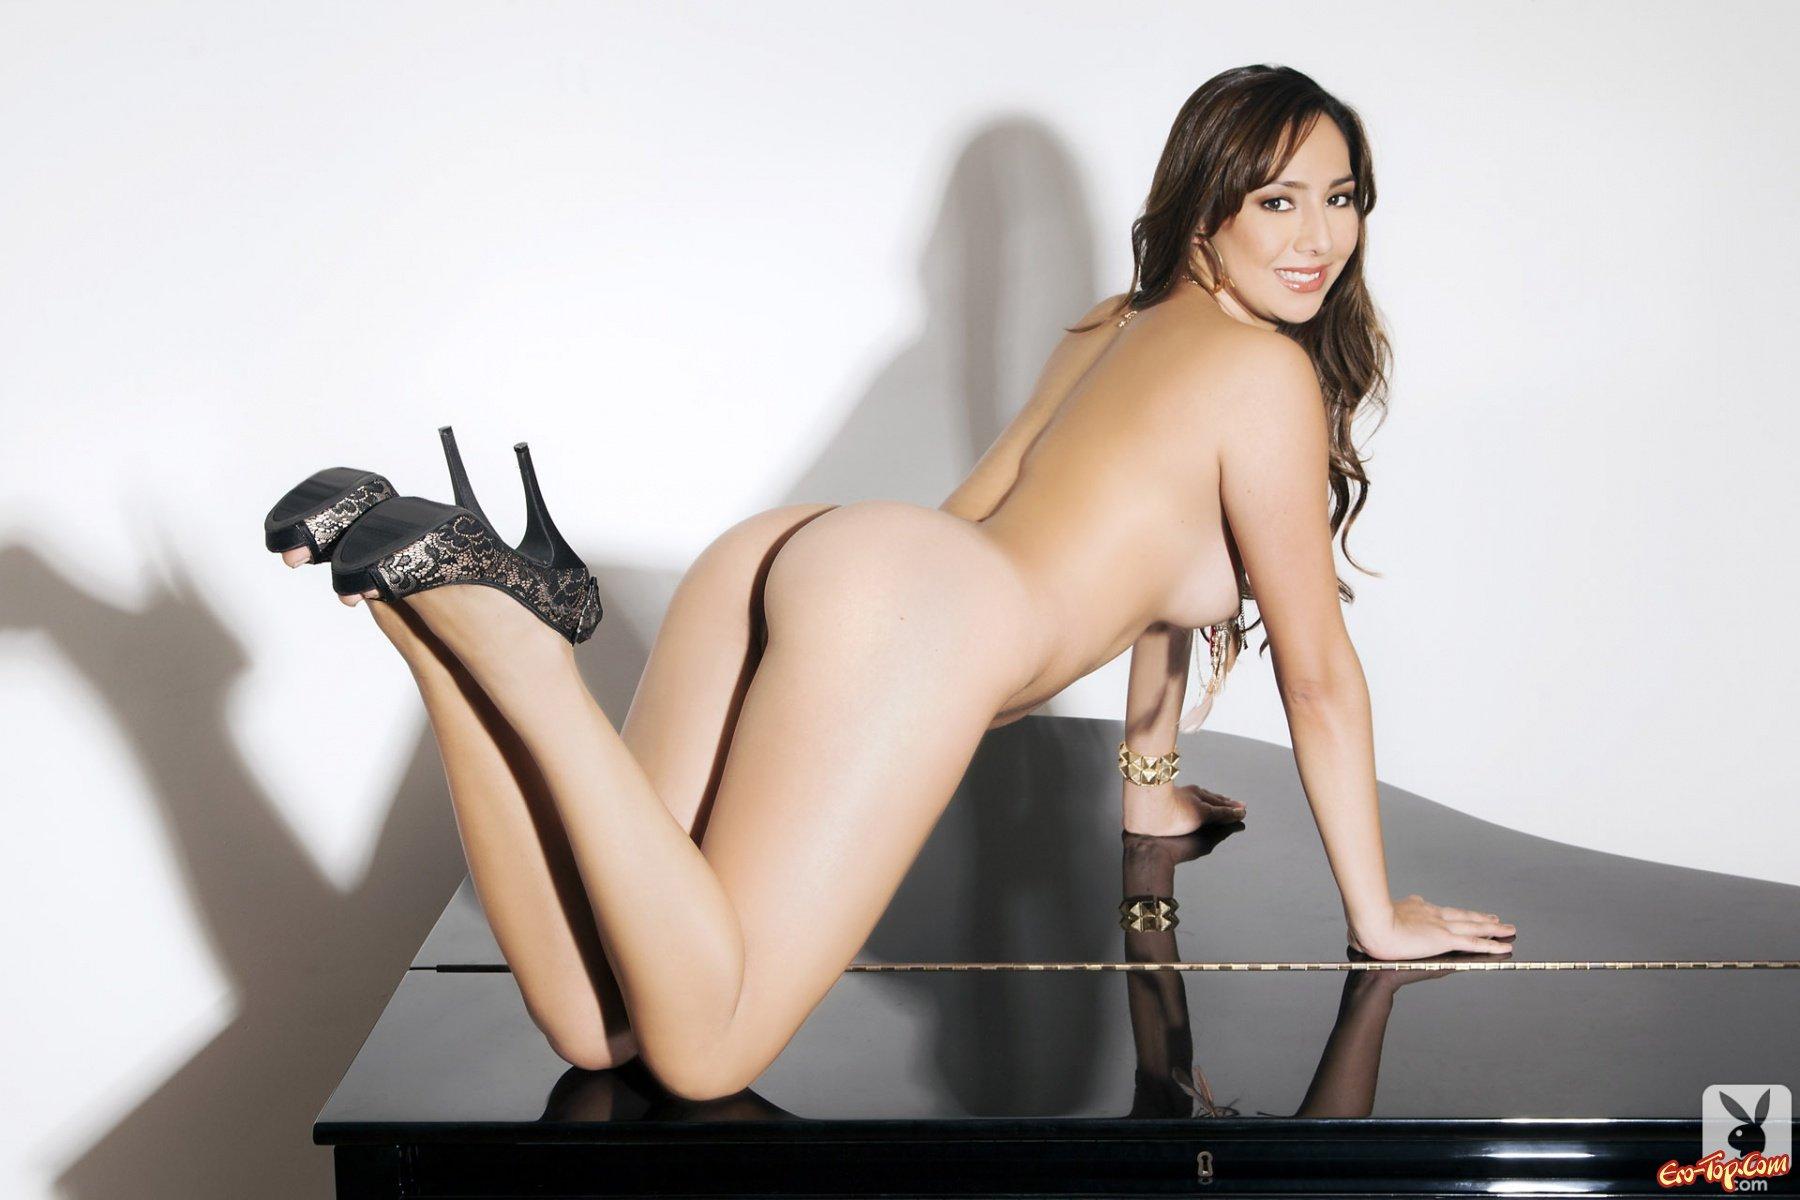 Обнаженная деваха на рояле